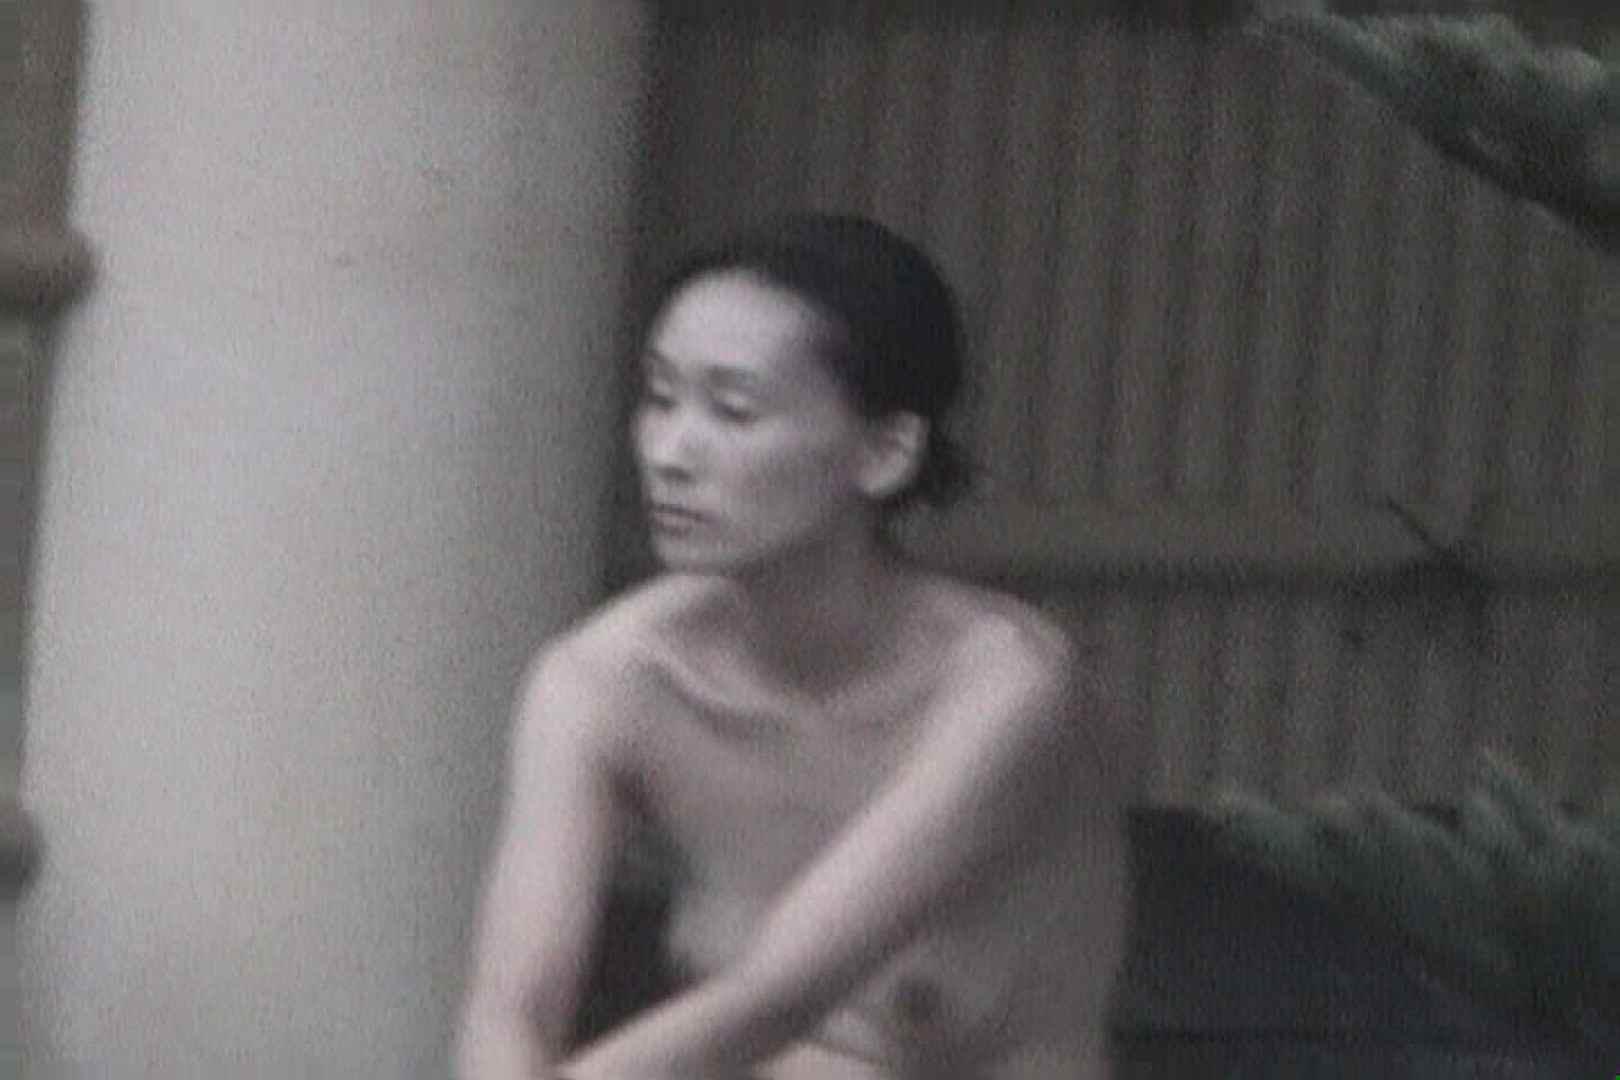 Aquaな露天風呂Vol.557 盗撮 盗み撮り動画キャプチャ 34連発 26